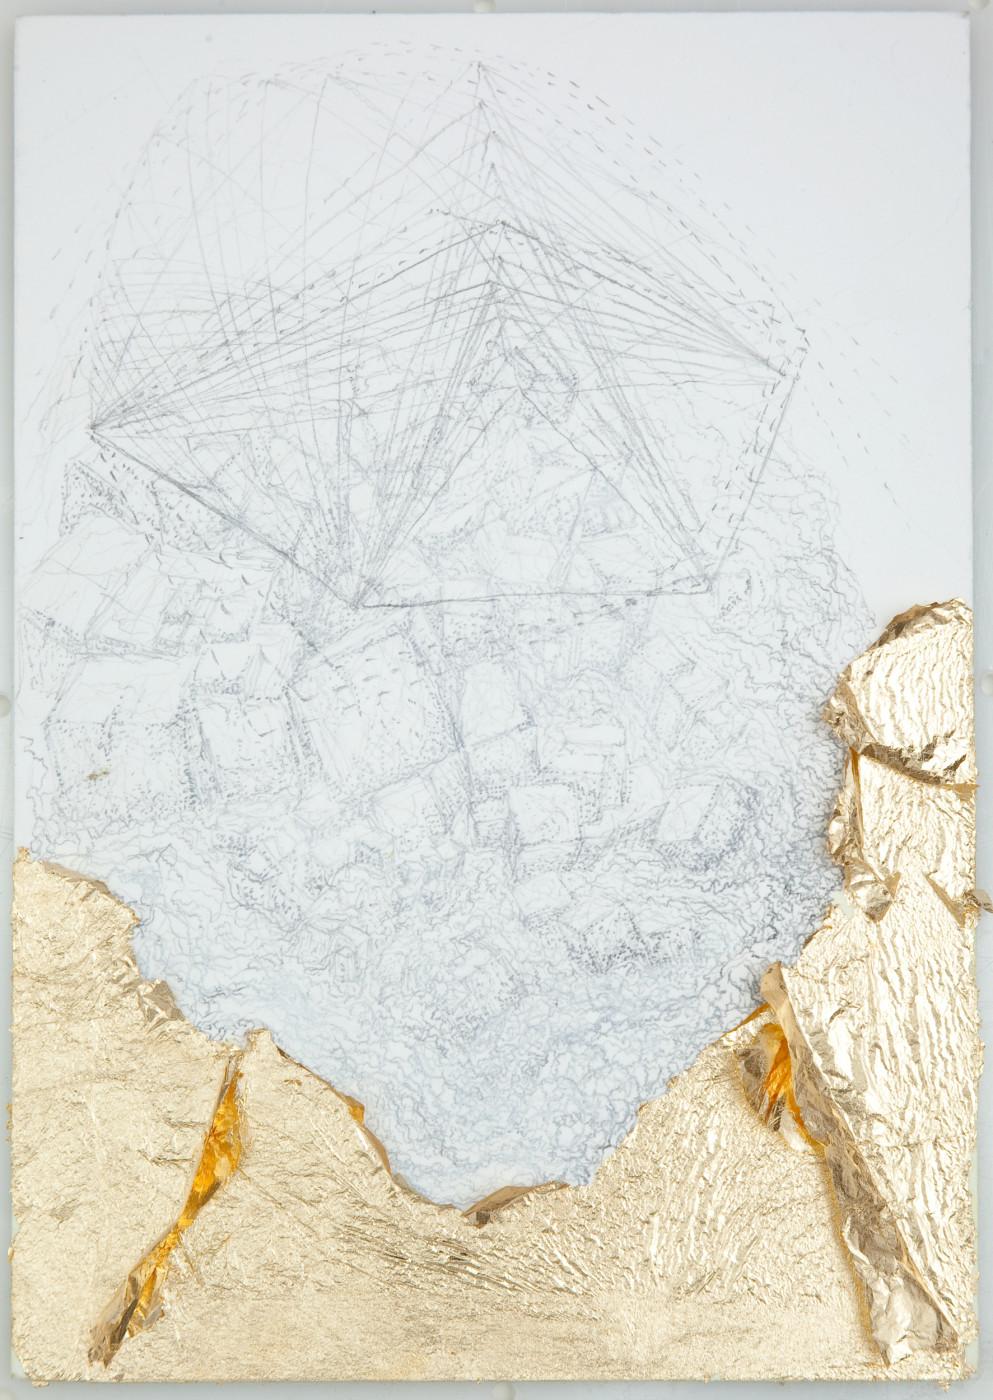 "<div class=""artwork_caption""><p>KHU Detroit Salt, 2009</p></div>"